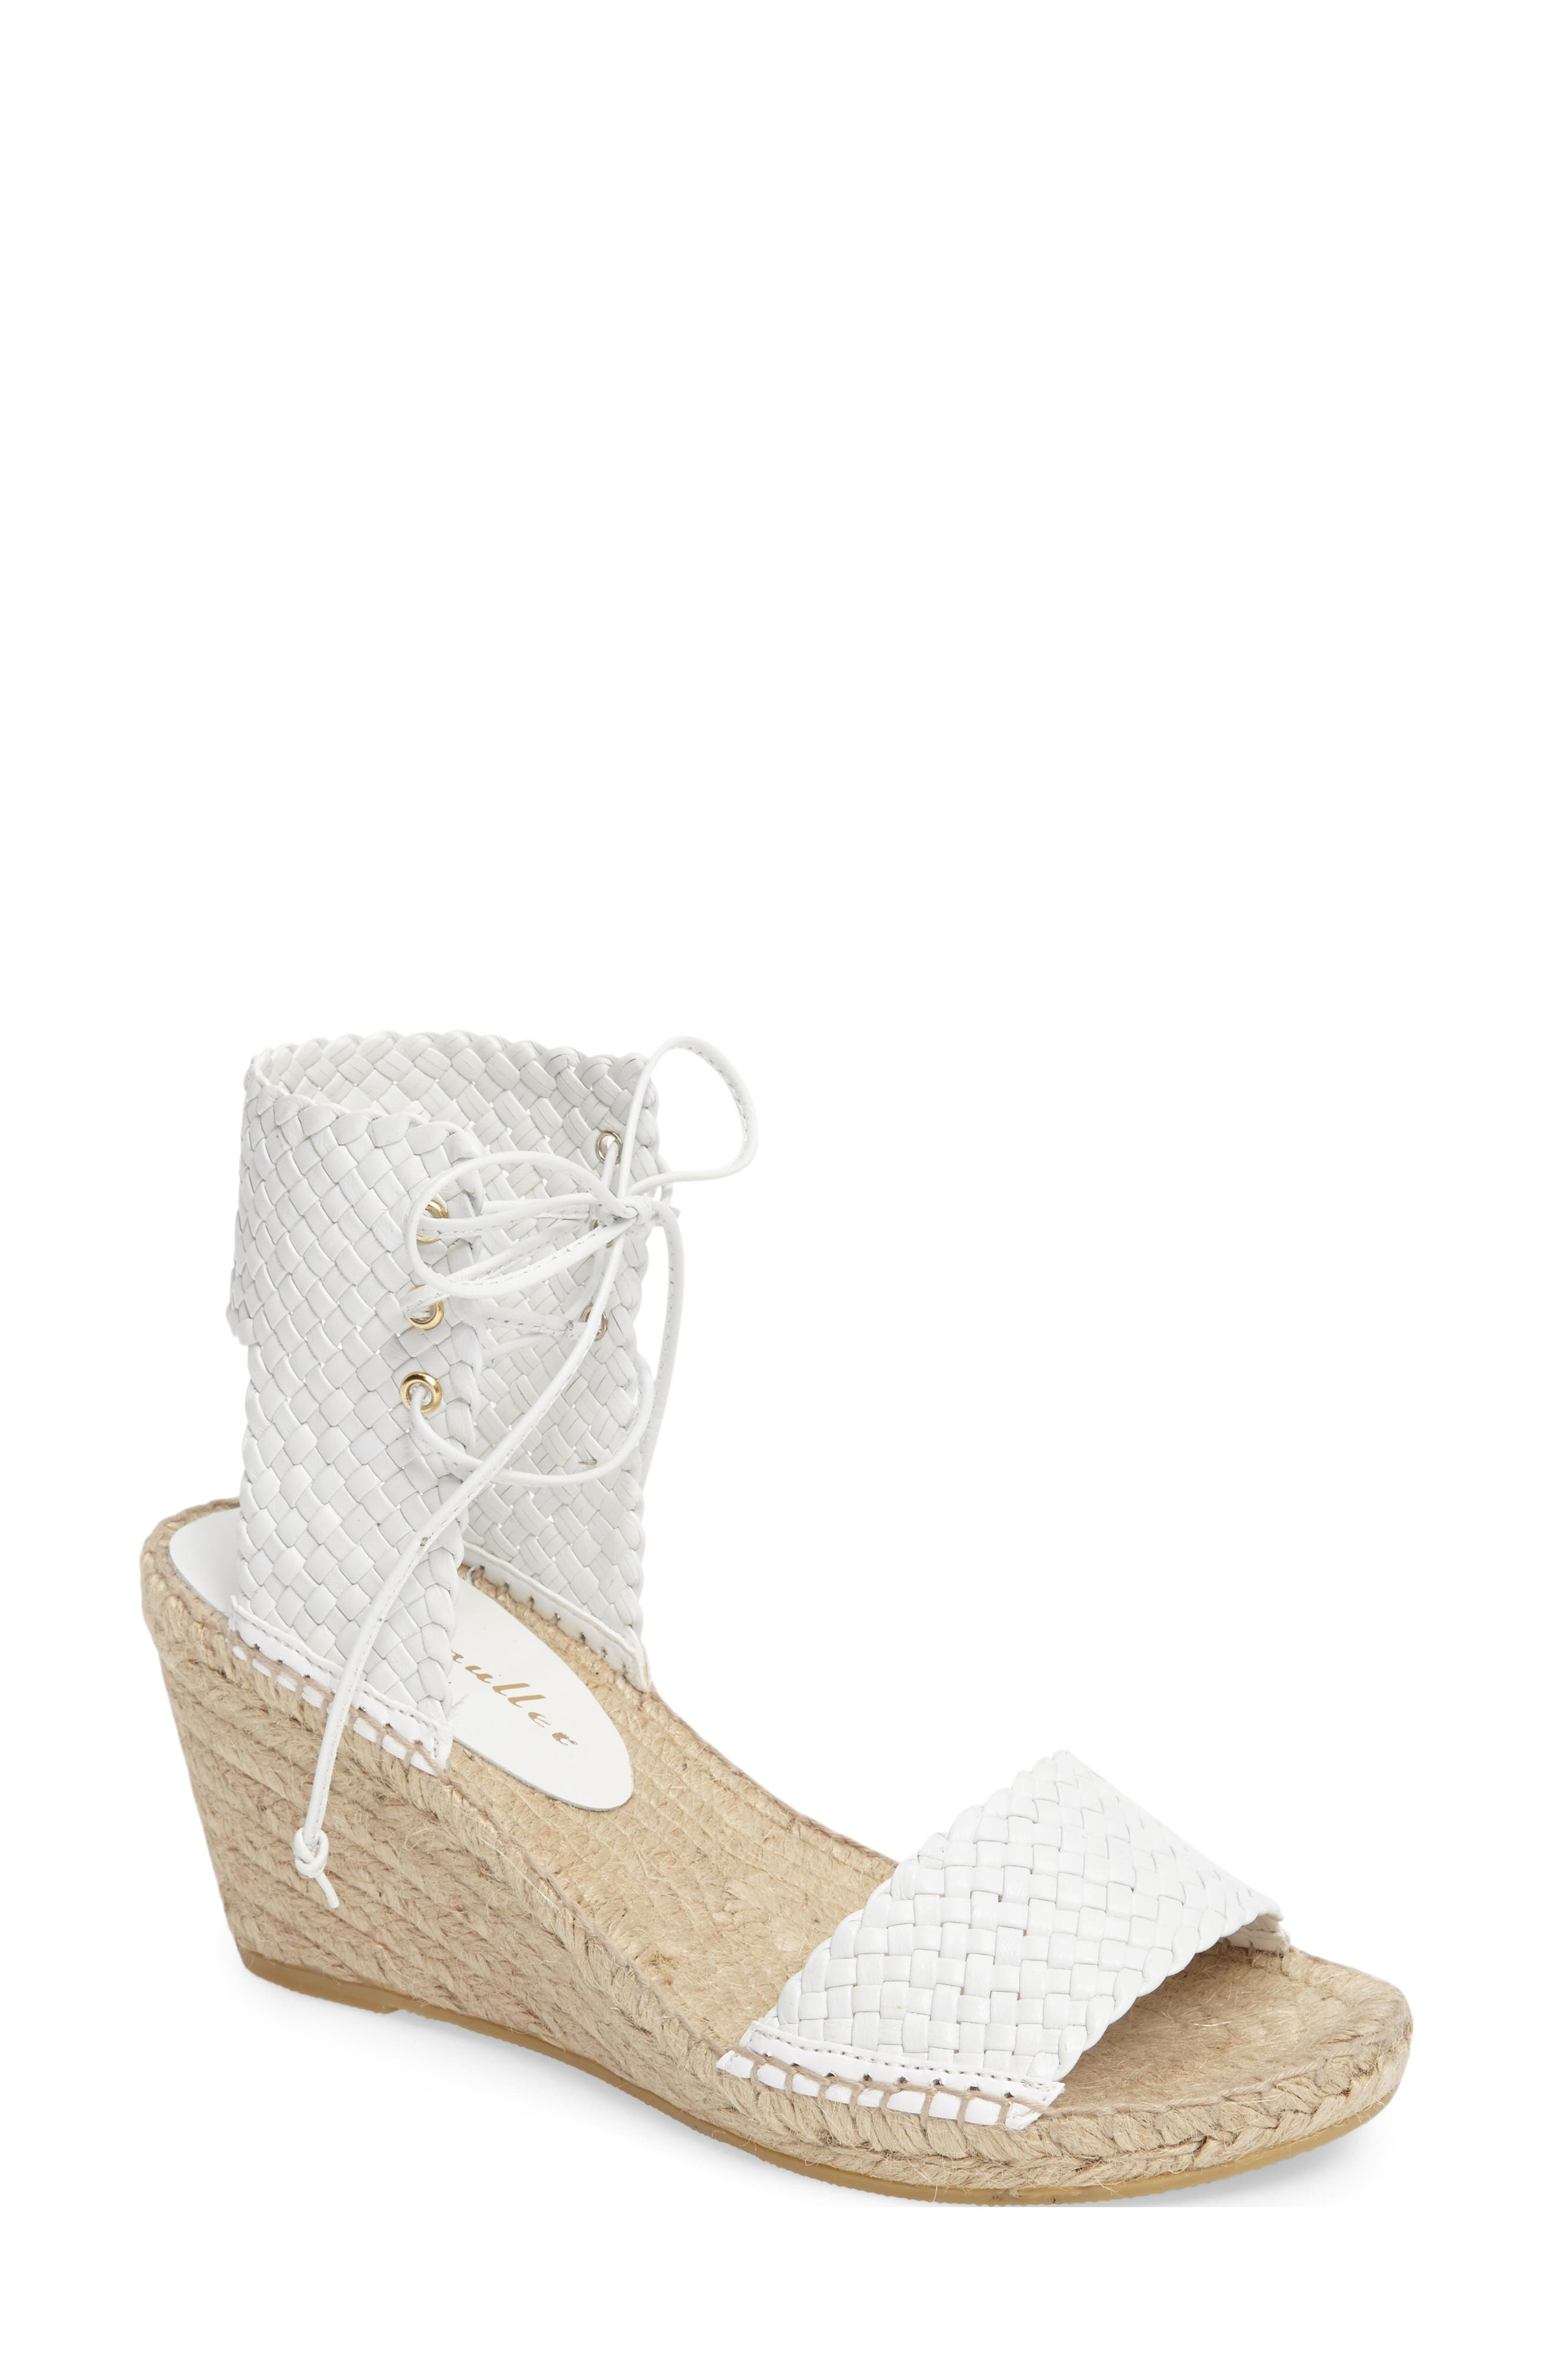 Bettye Muller Demee Woven Wedge Sandal (Women)